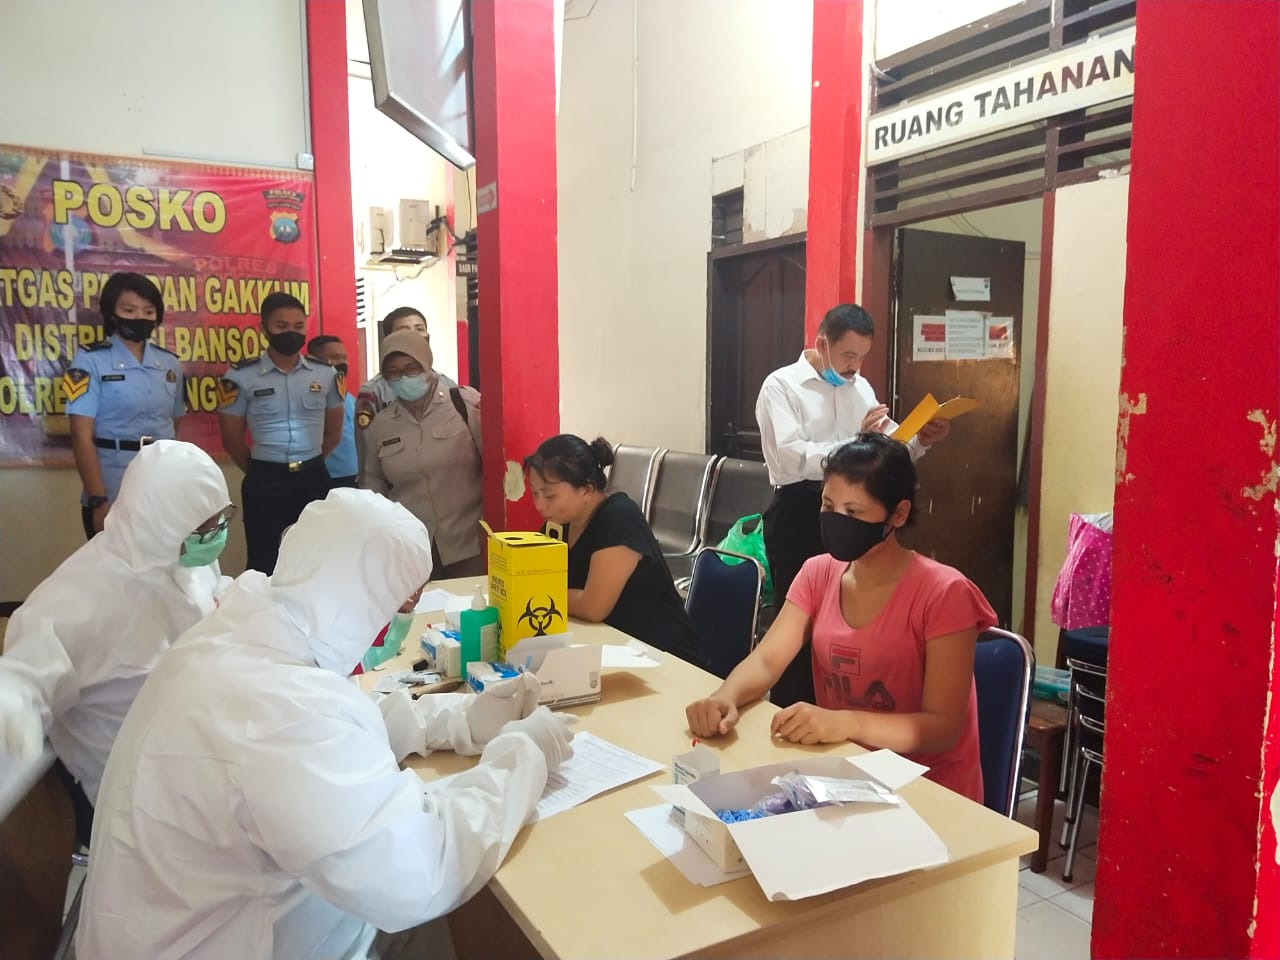 Jelang Pemindahan Ke Rutan, Polres Tanjungpinang Kembali Laksanakan Rapid Test Terhadap Tahanan